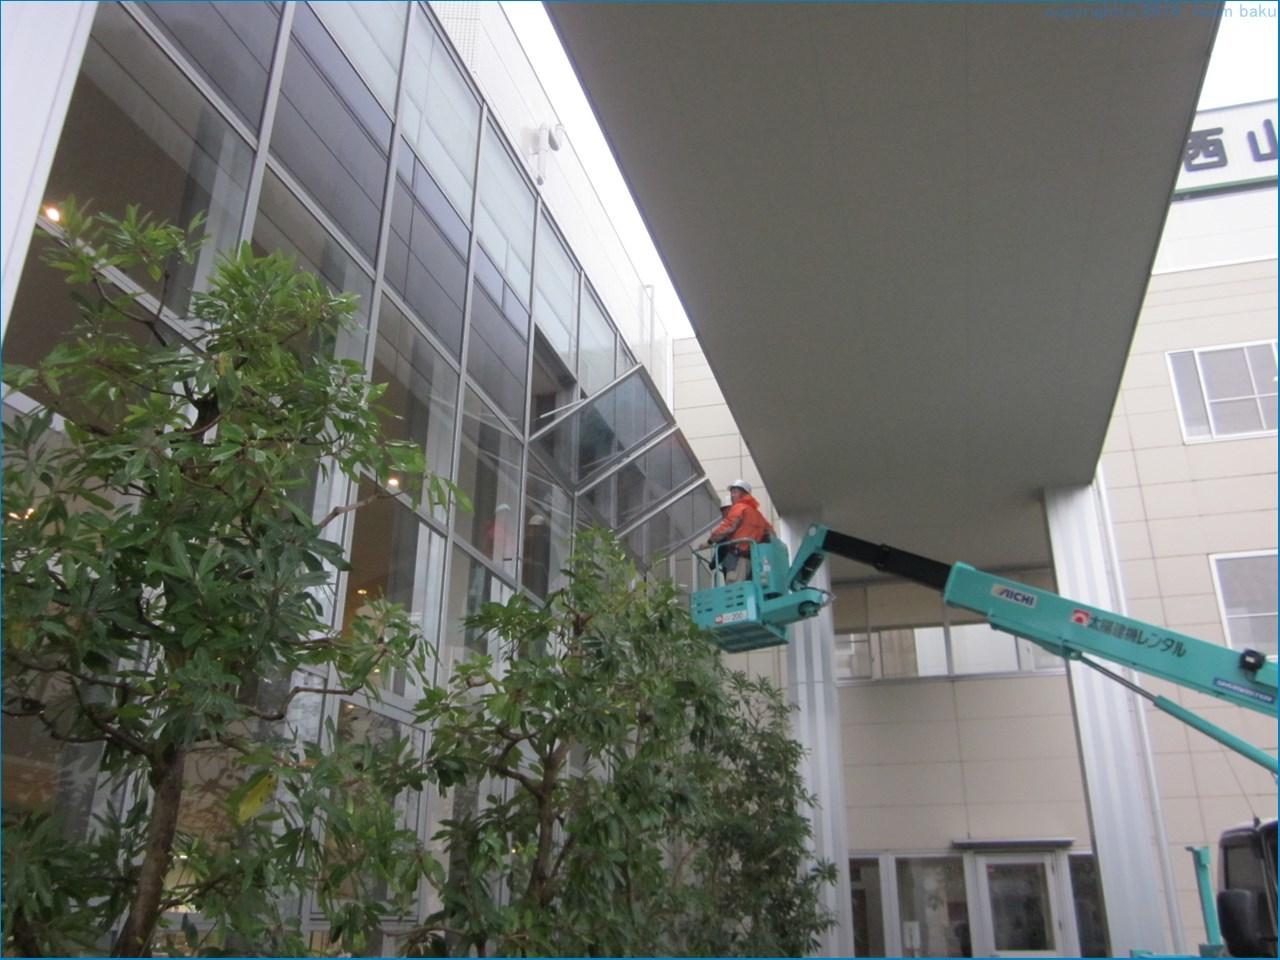 N病院グループ 特定建築物の定期報告調査4_c0376508_14134120.jpg